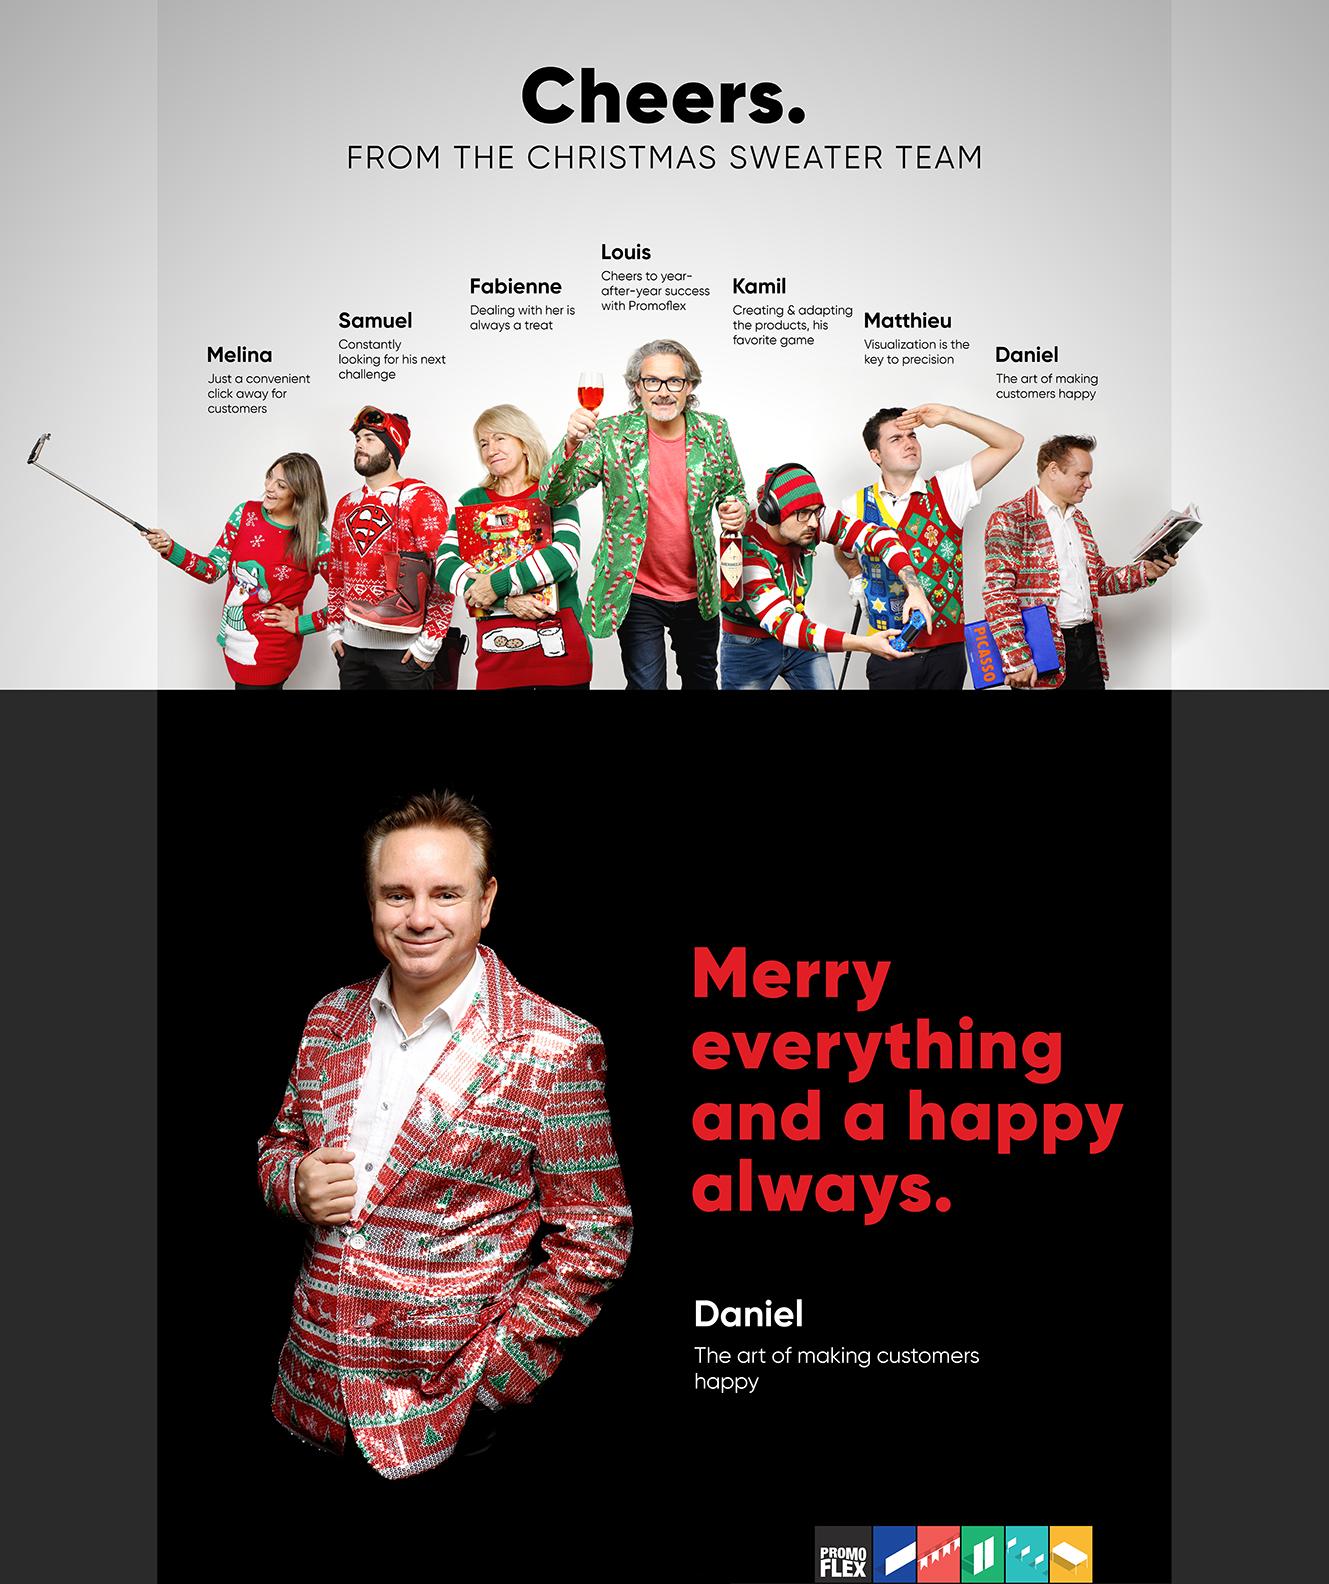 Holiday_sending_2018_grp_daniel_en.jpg (986 KB)